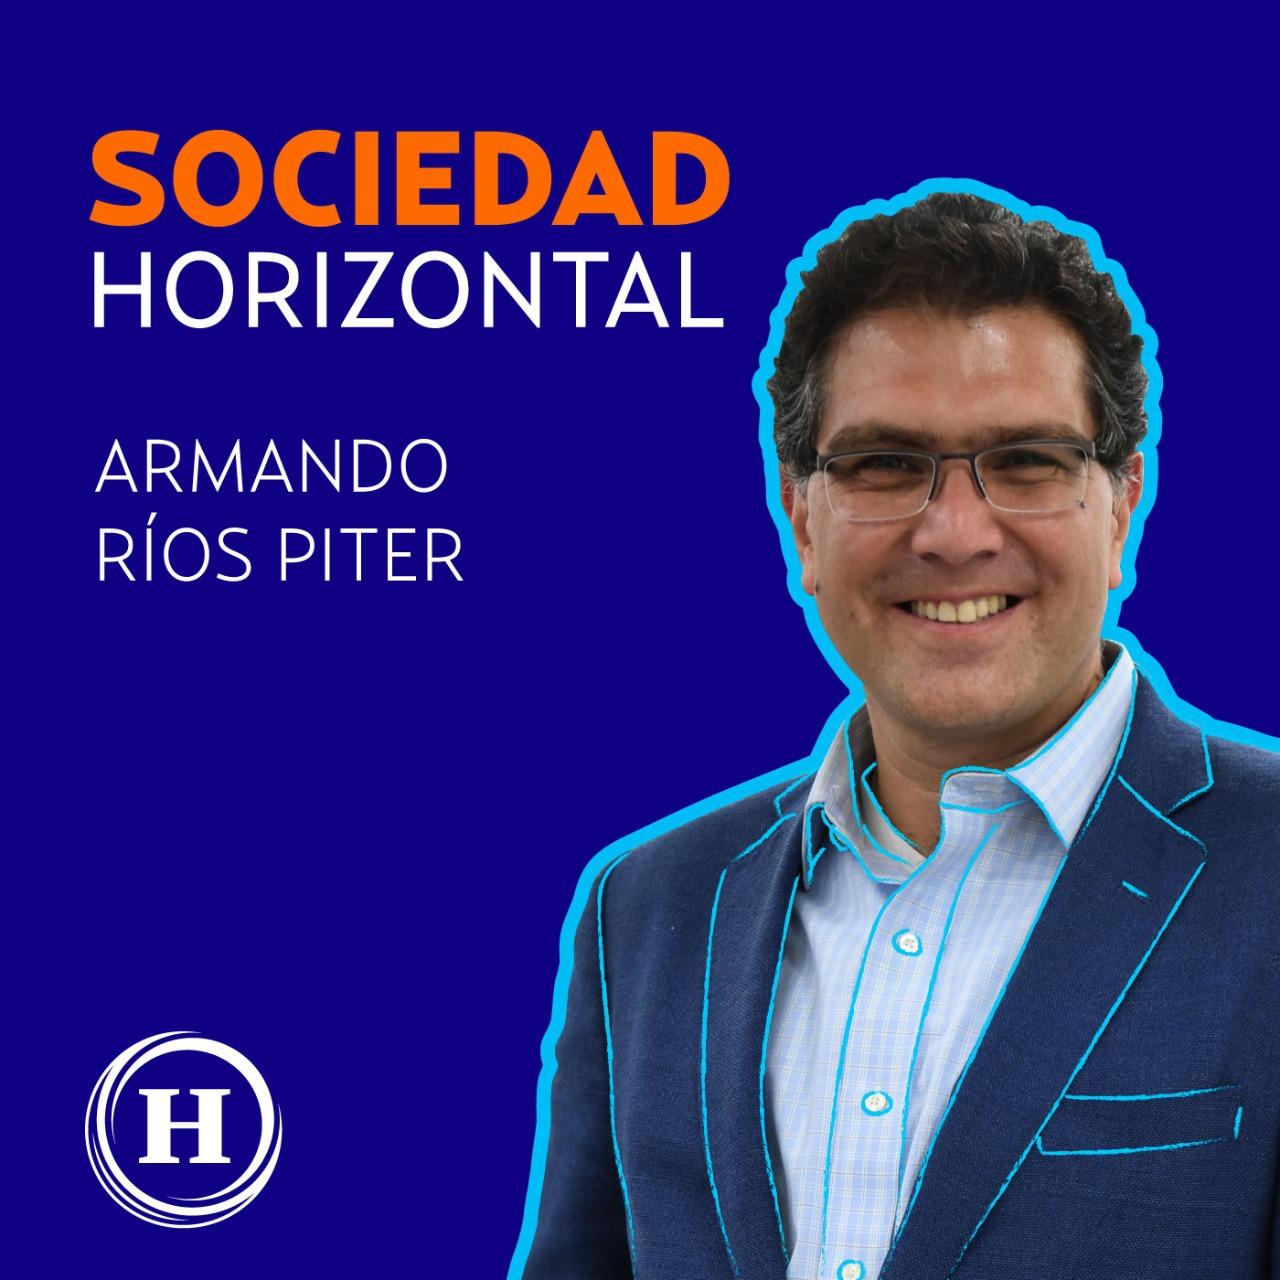 Sociedad Horizontal